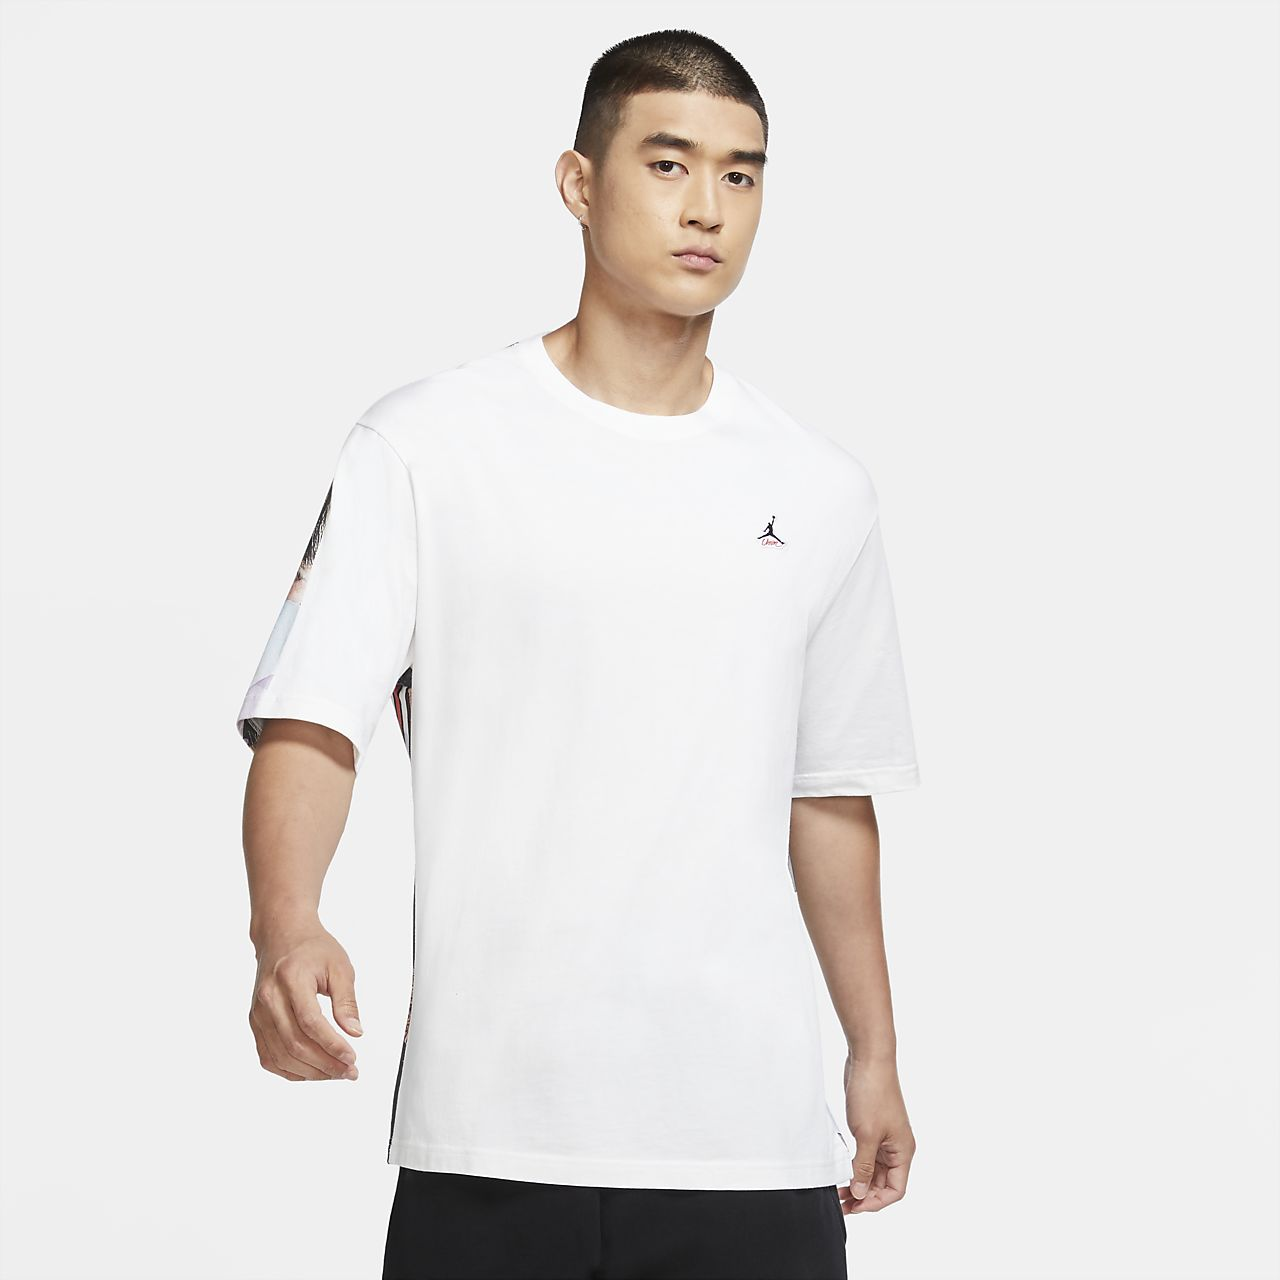 Jordan Flight Fleece Graphic Men's Shorts Black/White